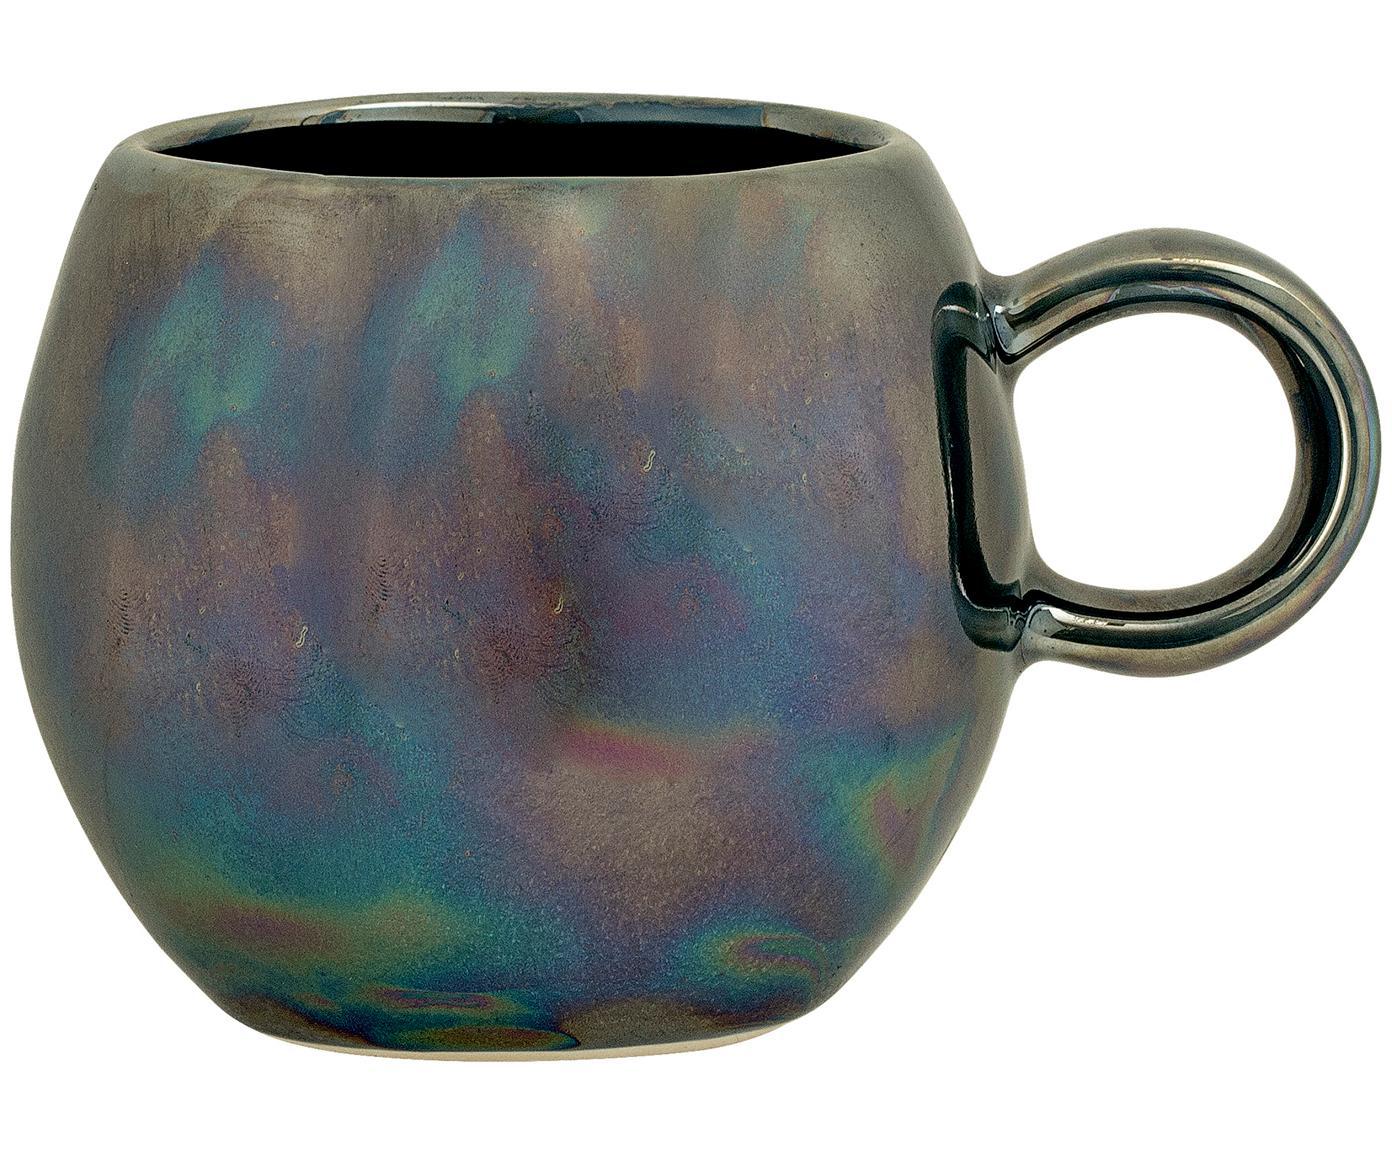 Tasse Paula mit effektvoller Glasur, Keramik, Blautöne, Grün, Ø 9 x H 8 cm